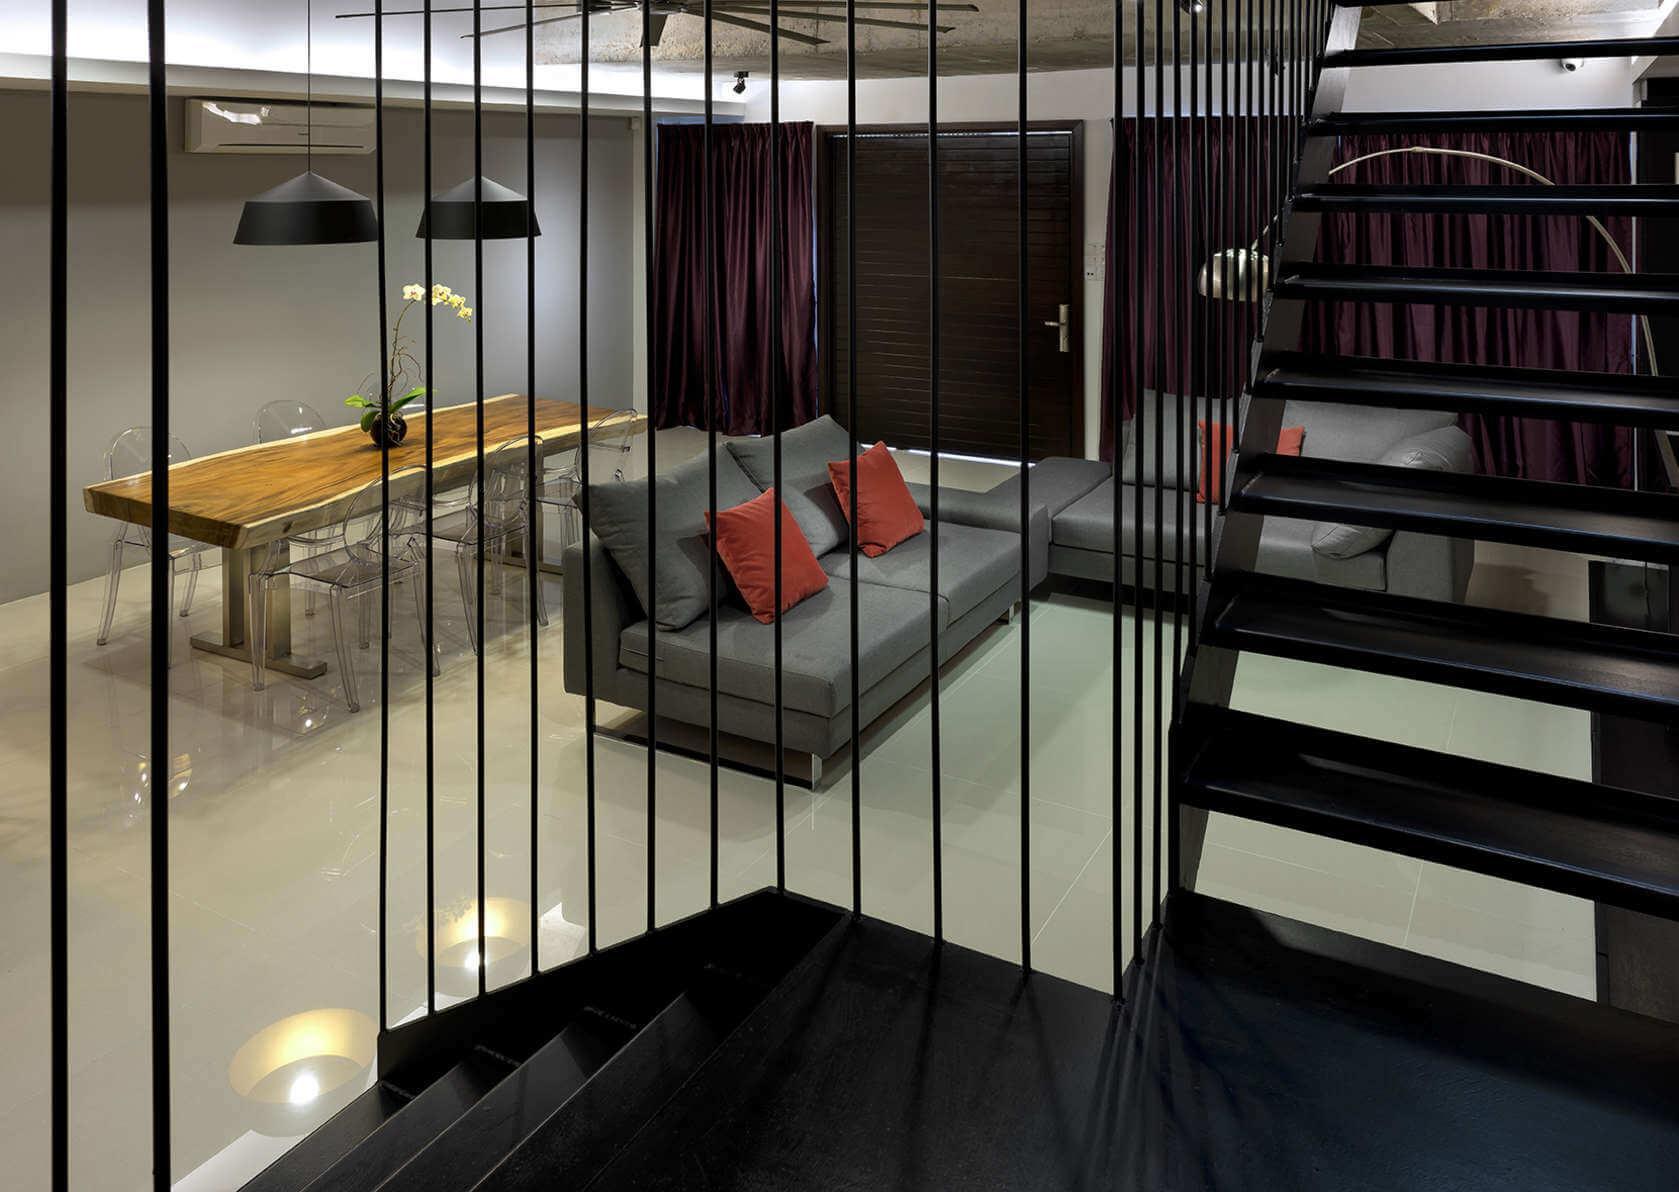 kuala-lumpur-home-drtan-lm-architect-09